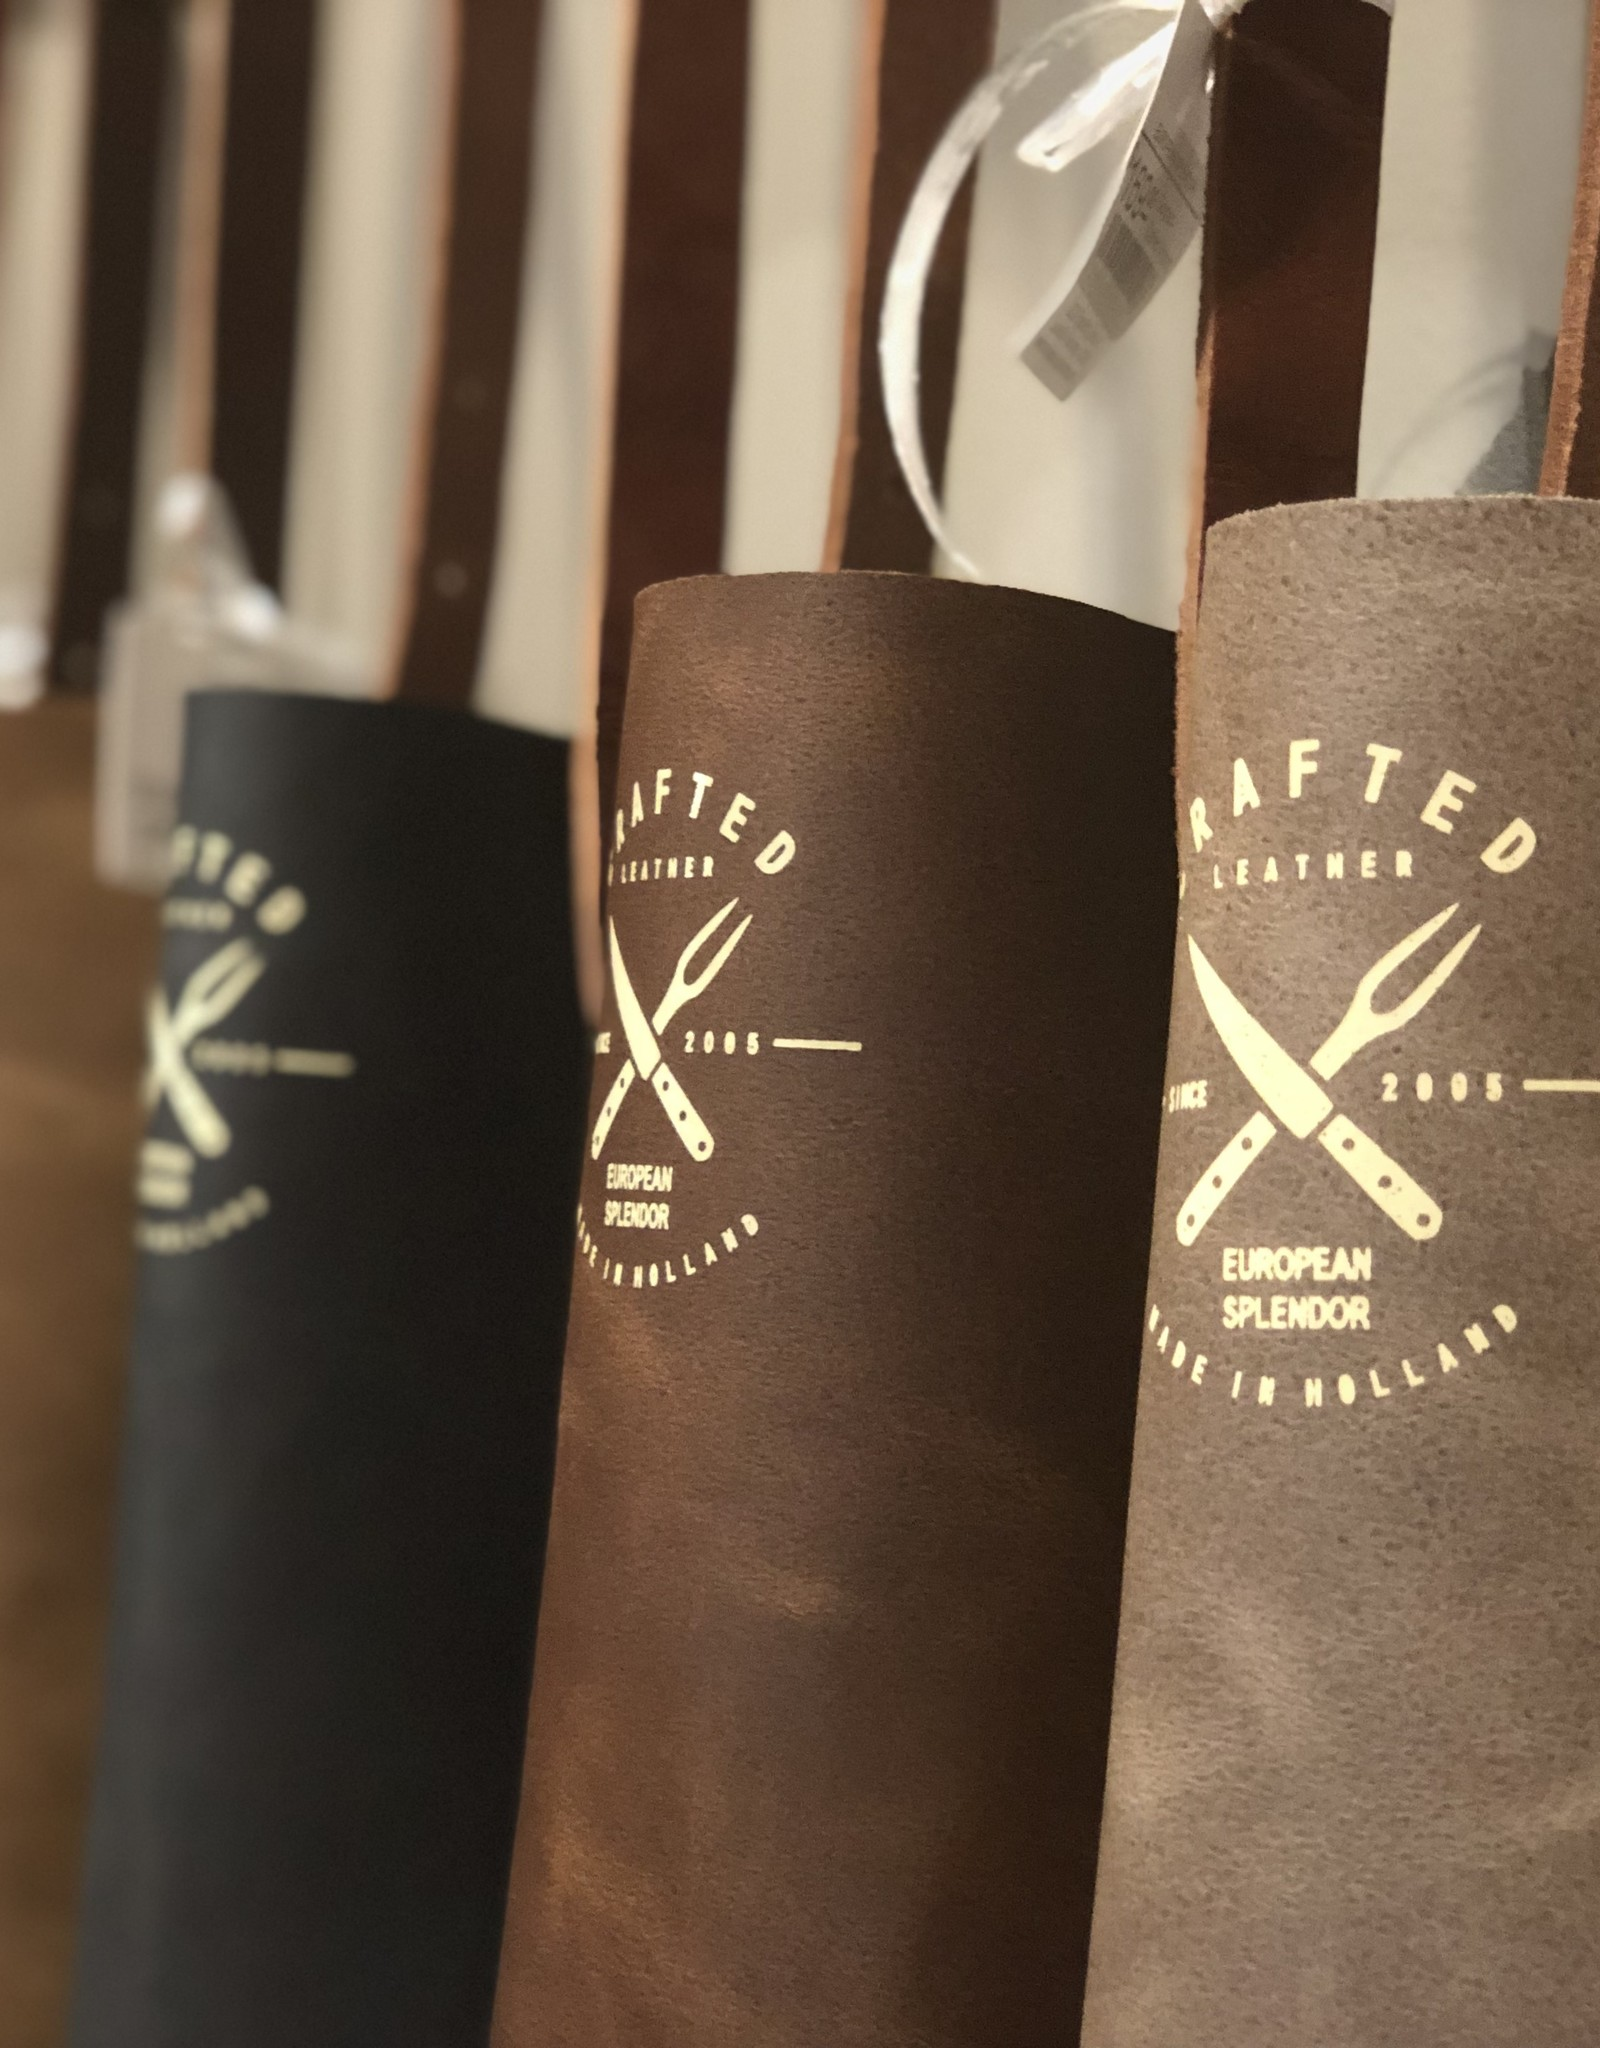 CL By European Splendor Cognac - Crafted Vintage Leather Apron